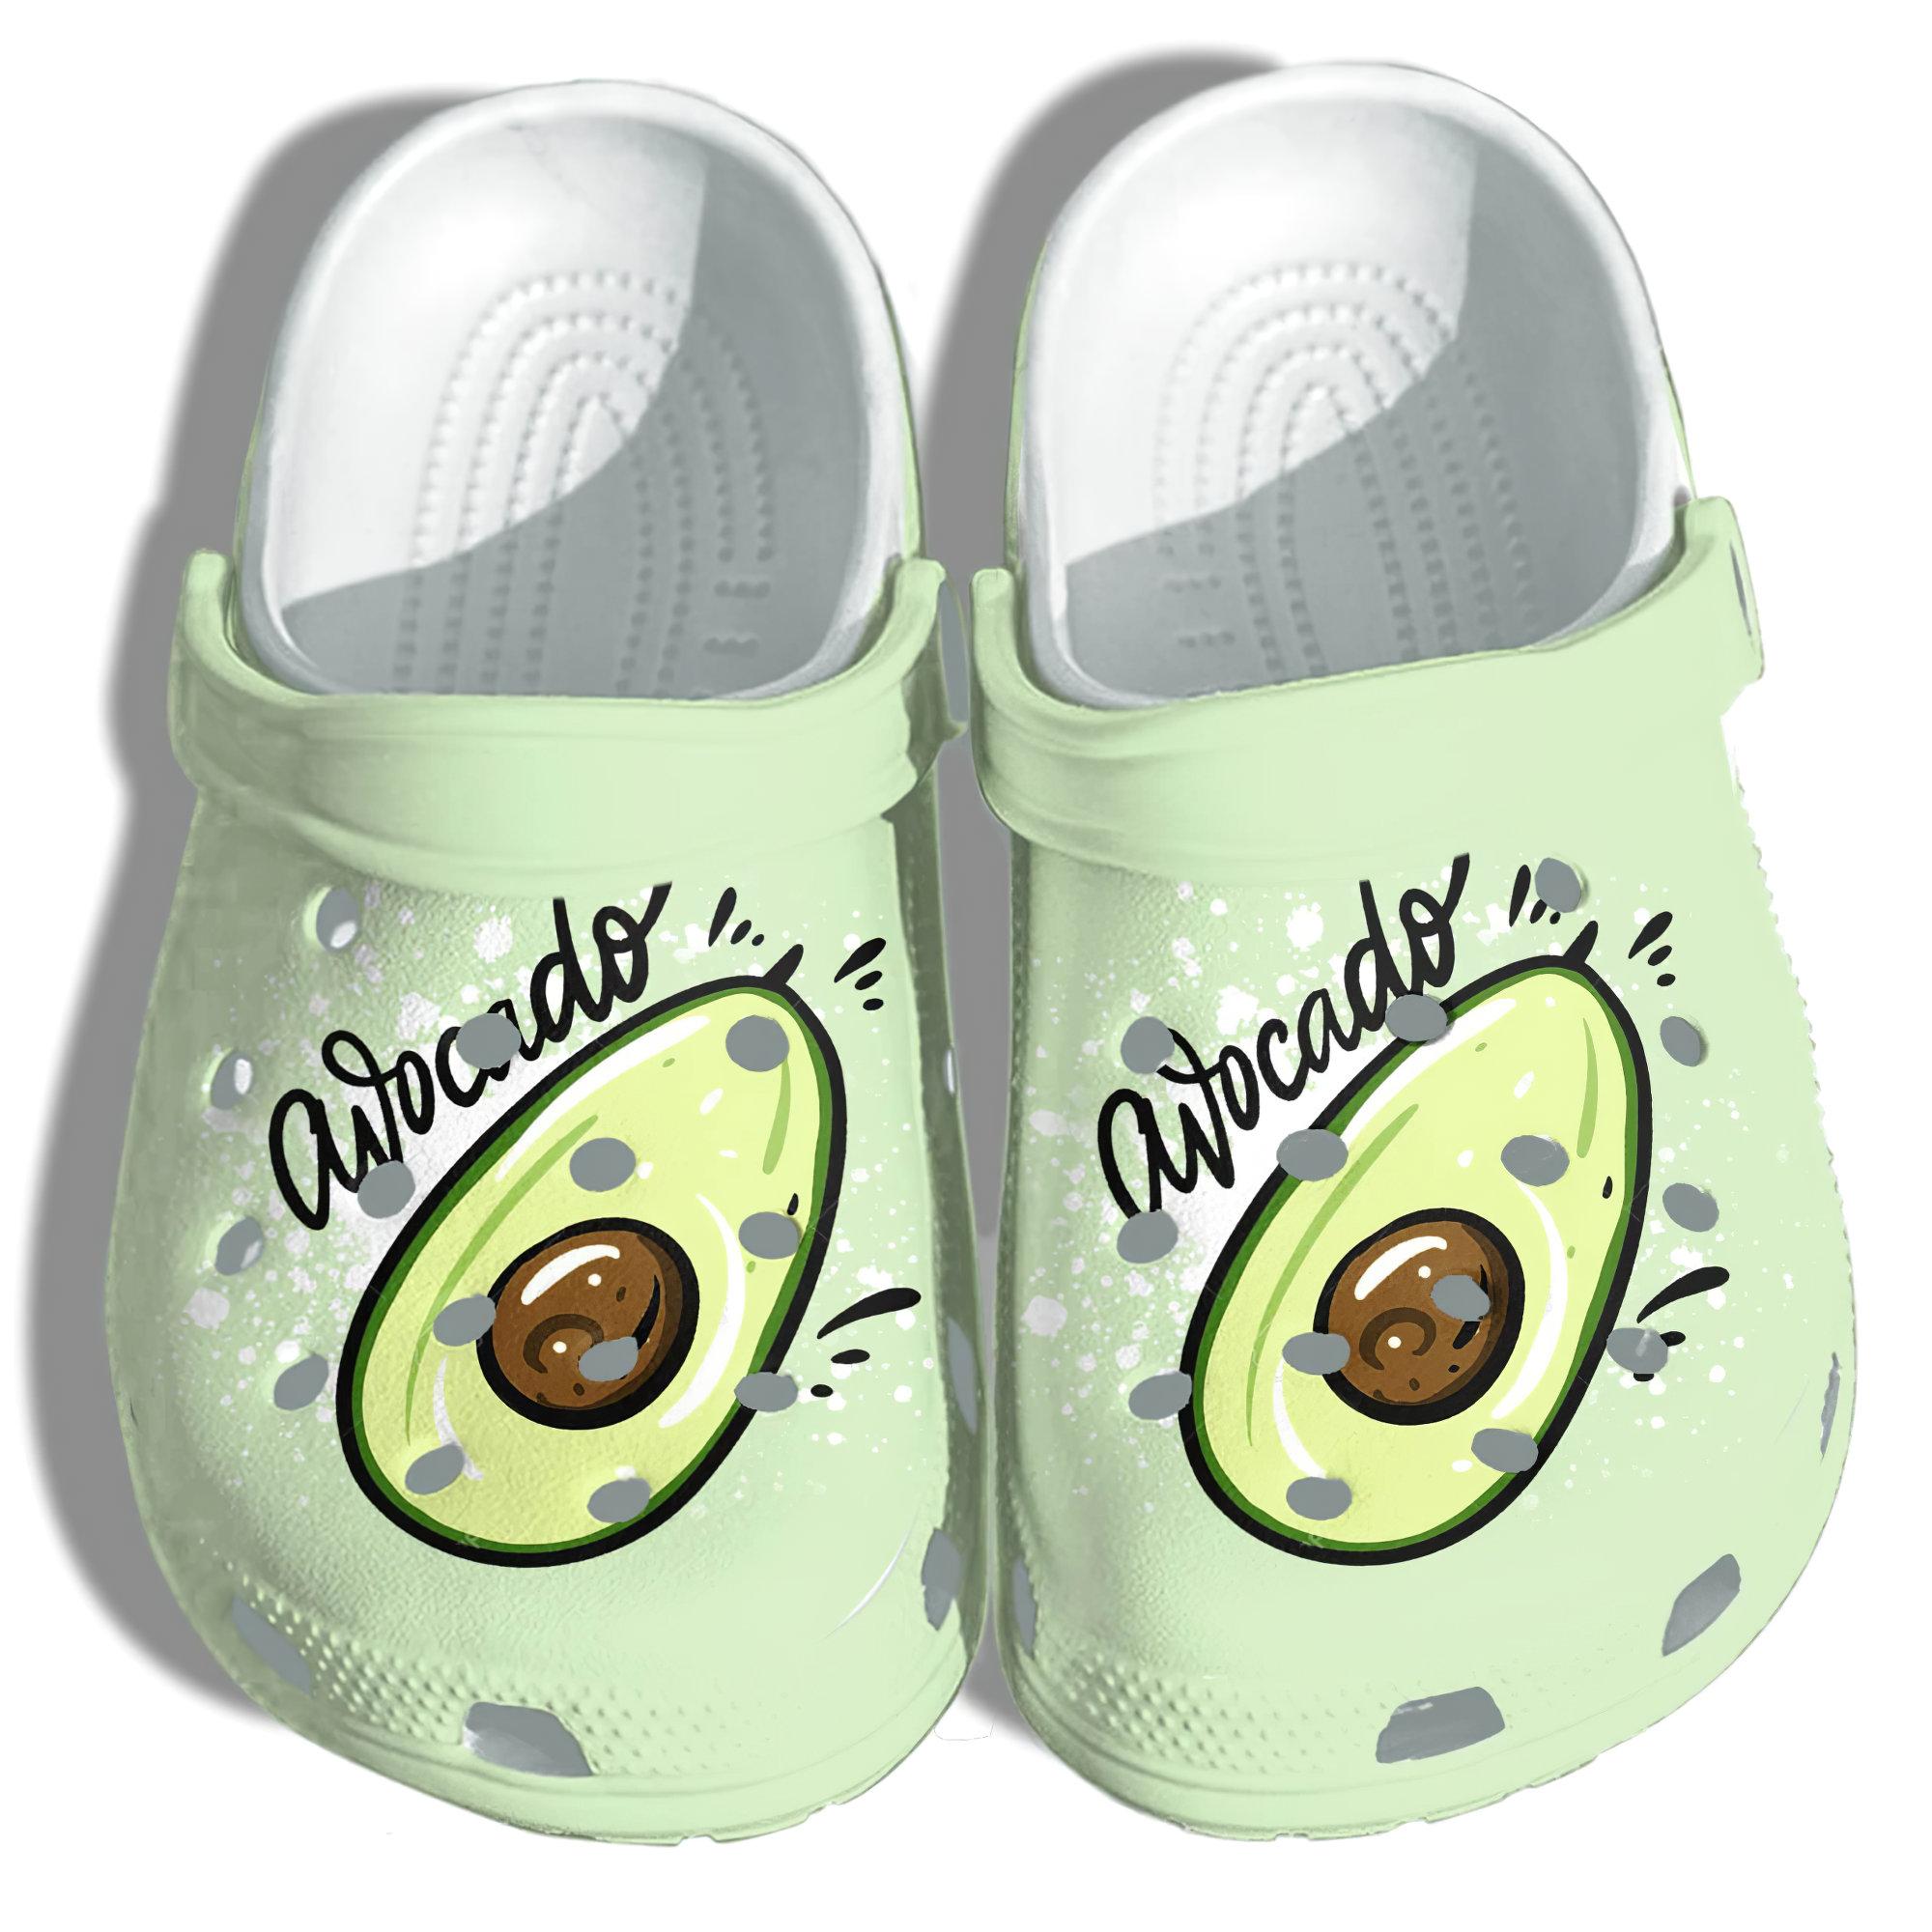 Avocado Cute Funny Crocs Clog Shoes